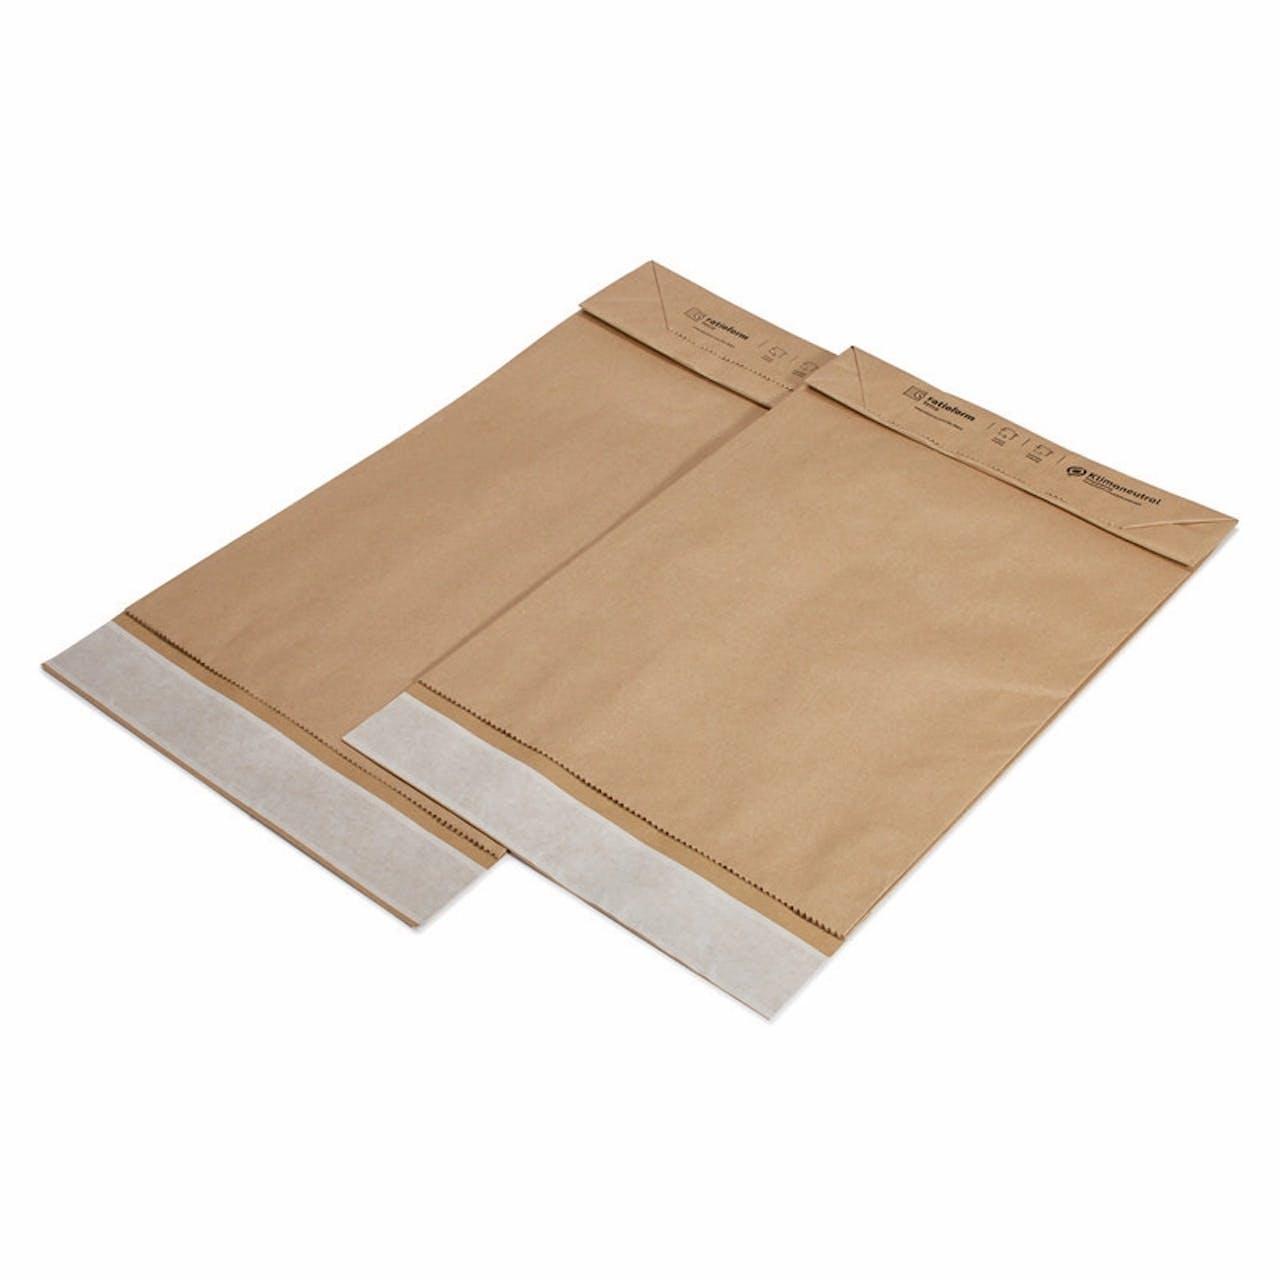 Faltentasche terra, recyceltes Papier